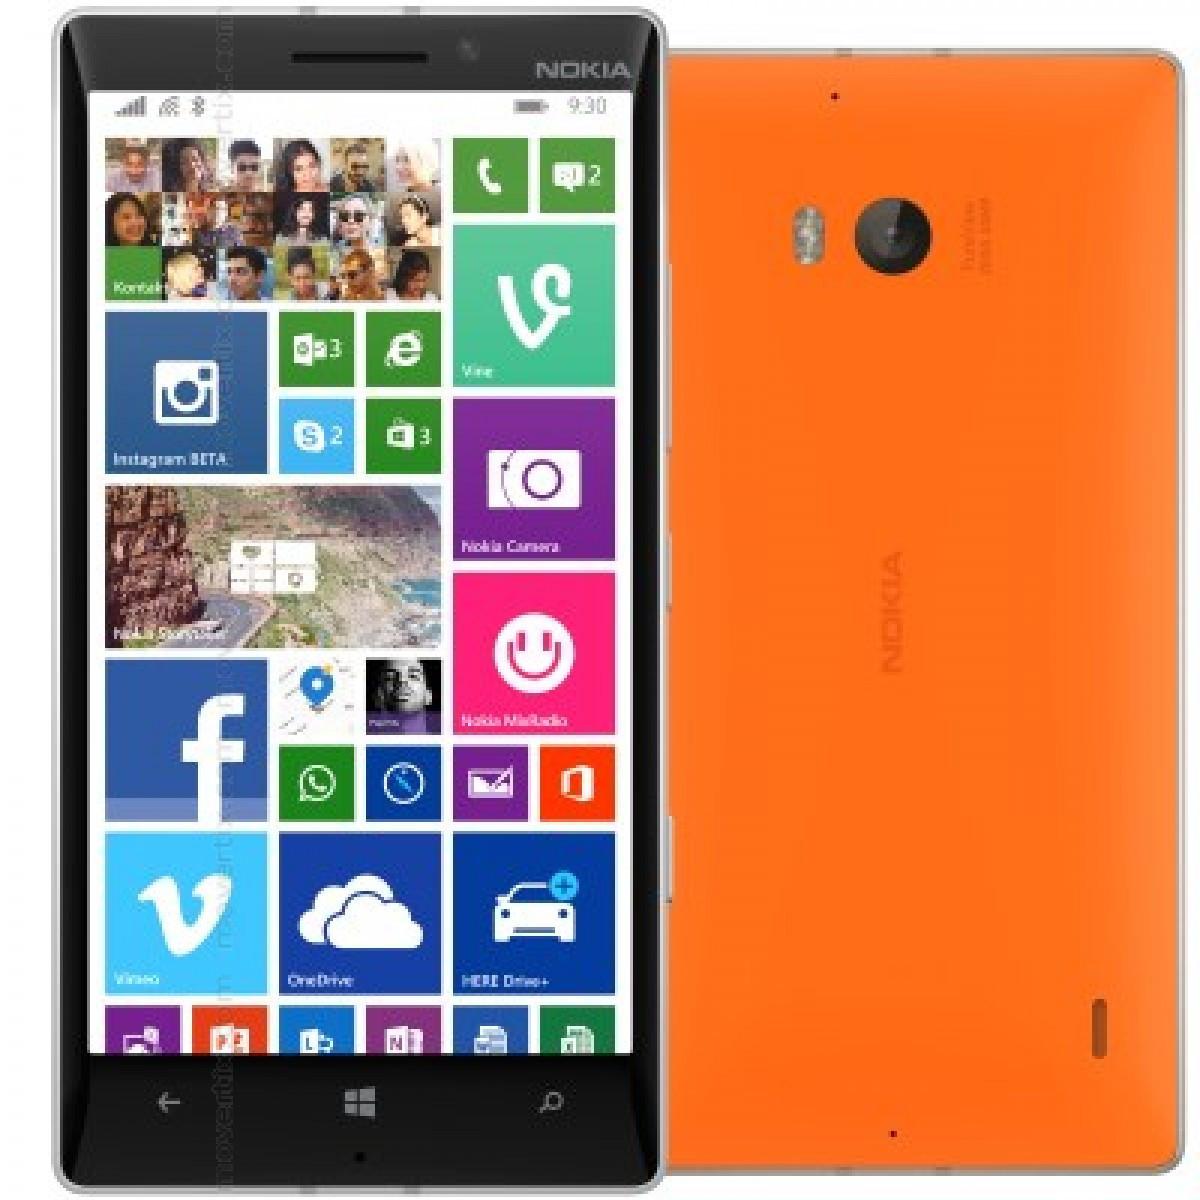 Смартфон Nokia Lumia 930 Orange Win10, FHD, 20MP 2\32gb Quad core 2.2 GHz2420 mAh + подарунки